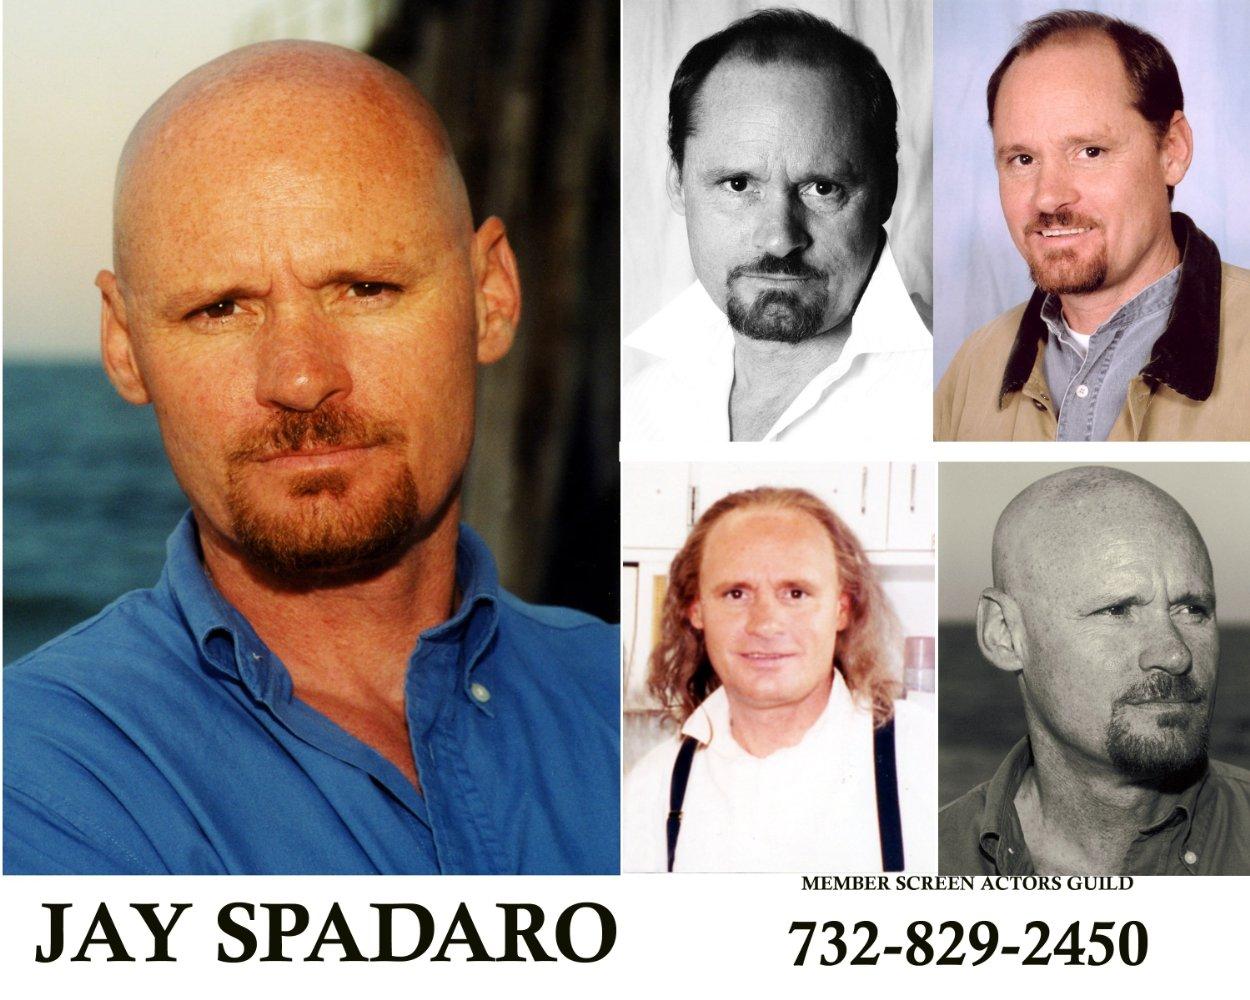 Jay Spadaro